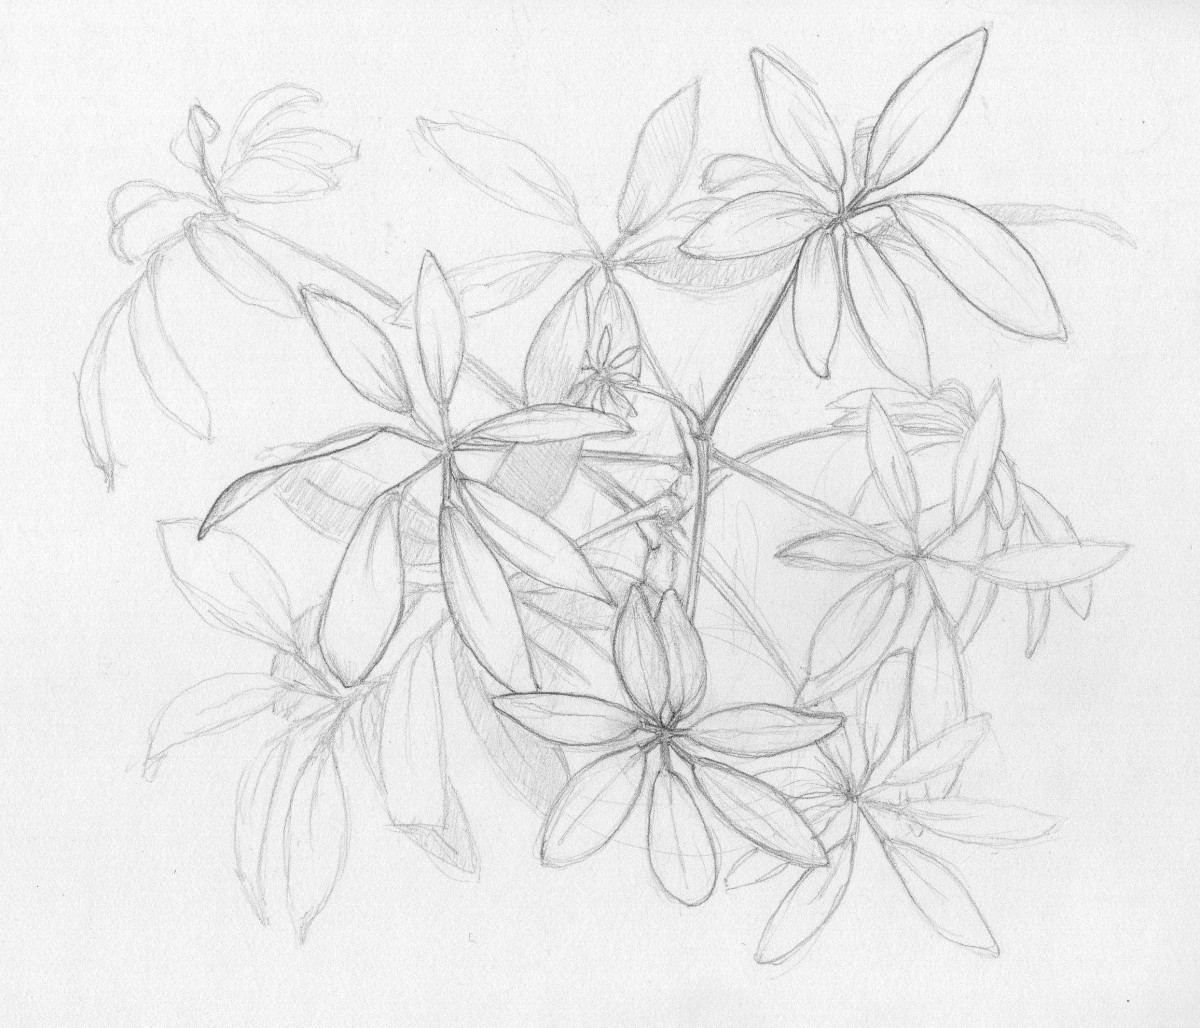 Fireworks - original drawing of Shefflera plant